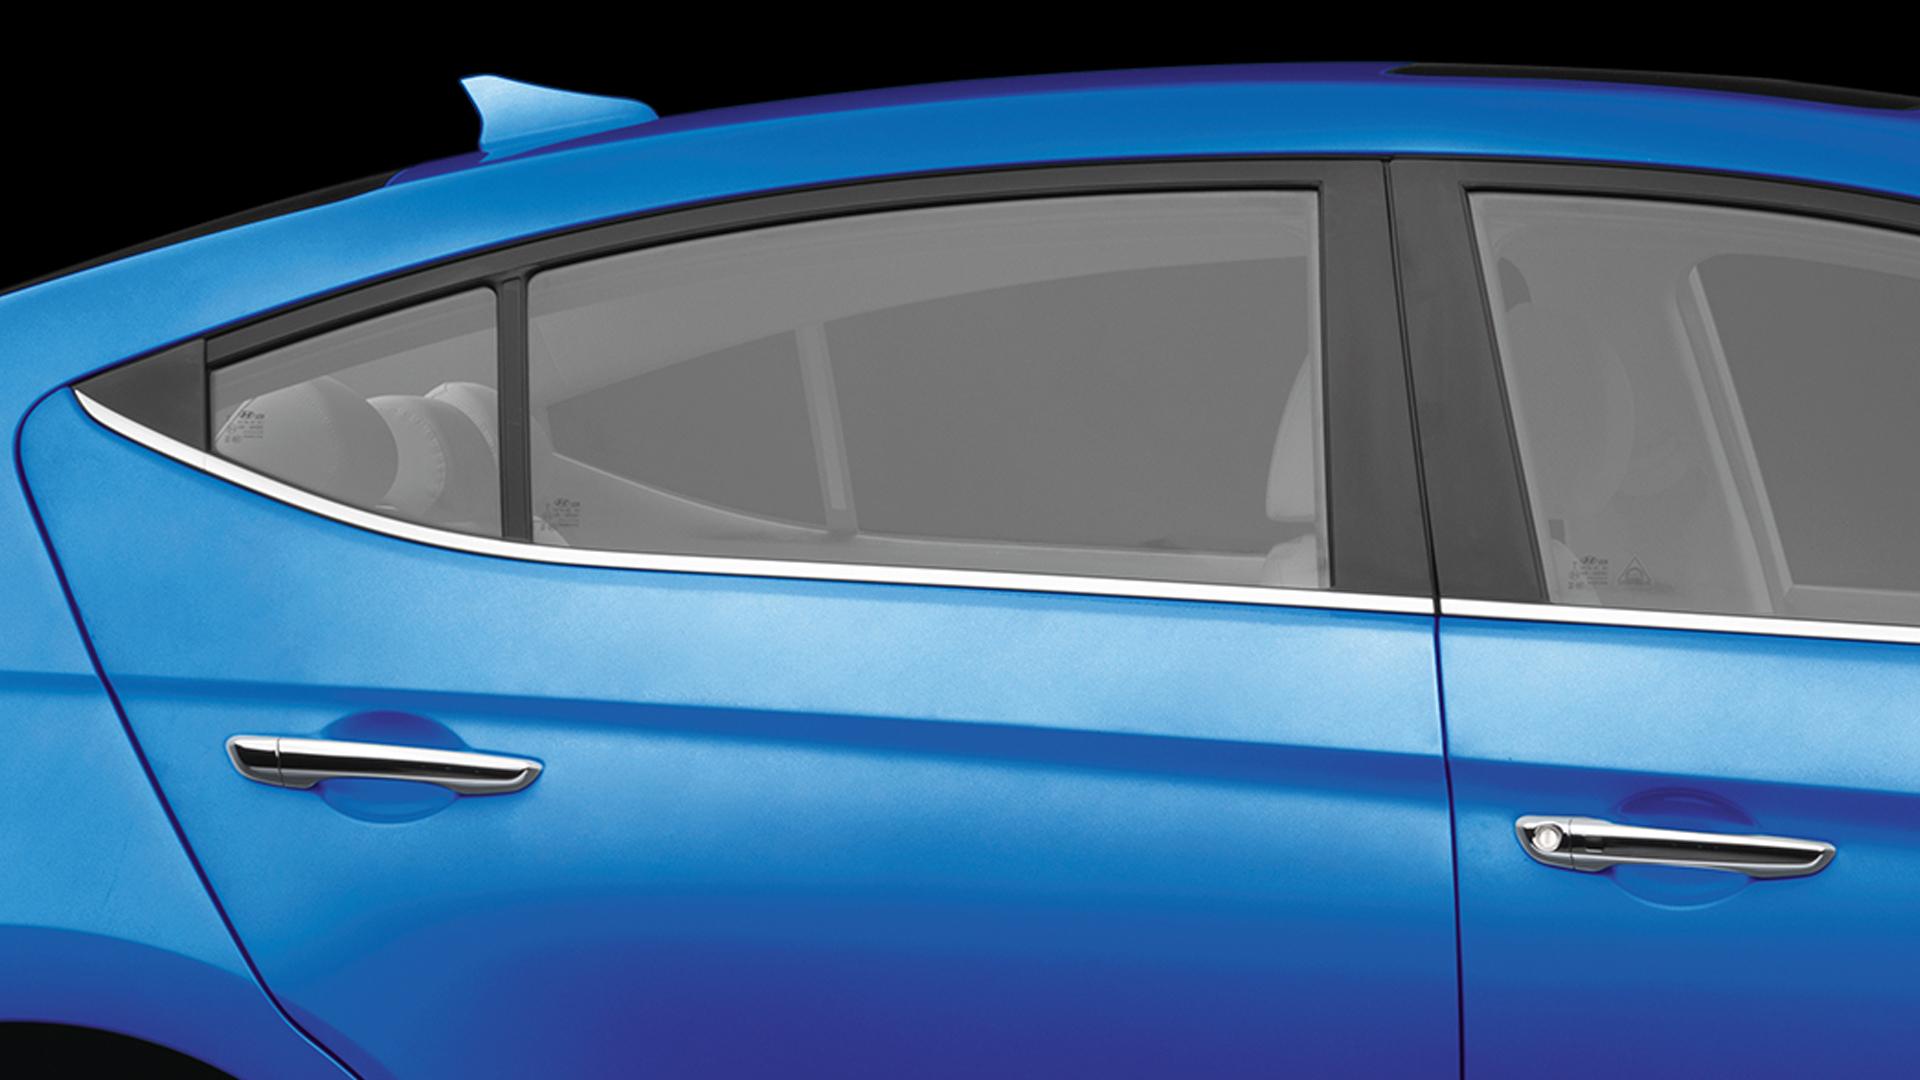 Hyundai Elantra 2019 2.0 Petrol SX (O)AT Exterior